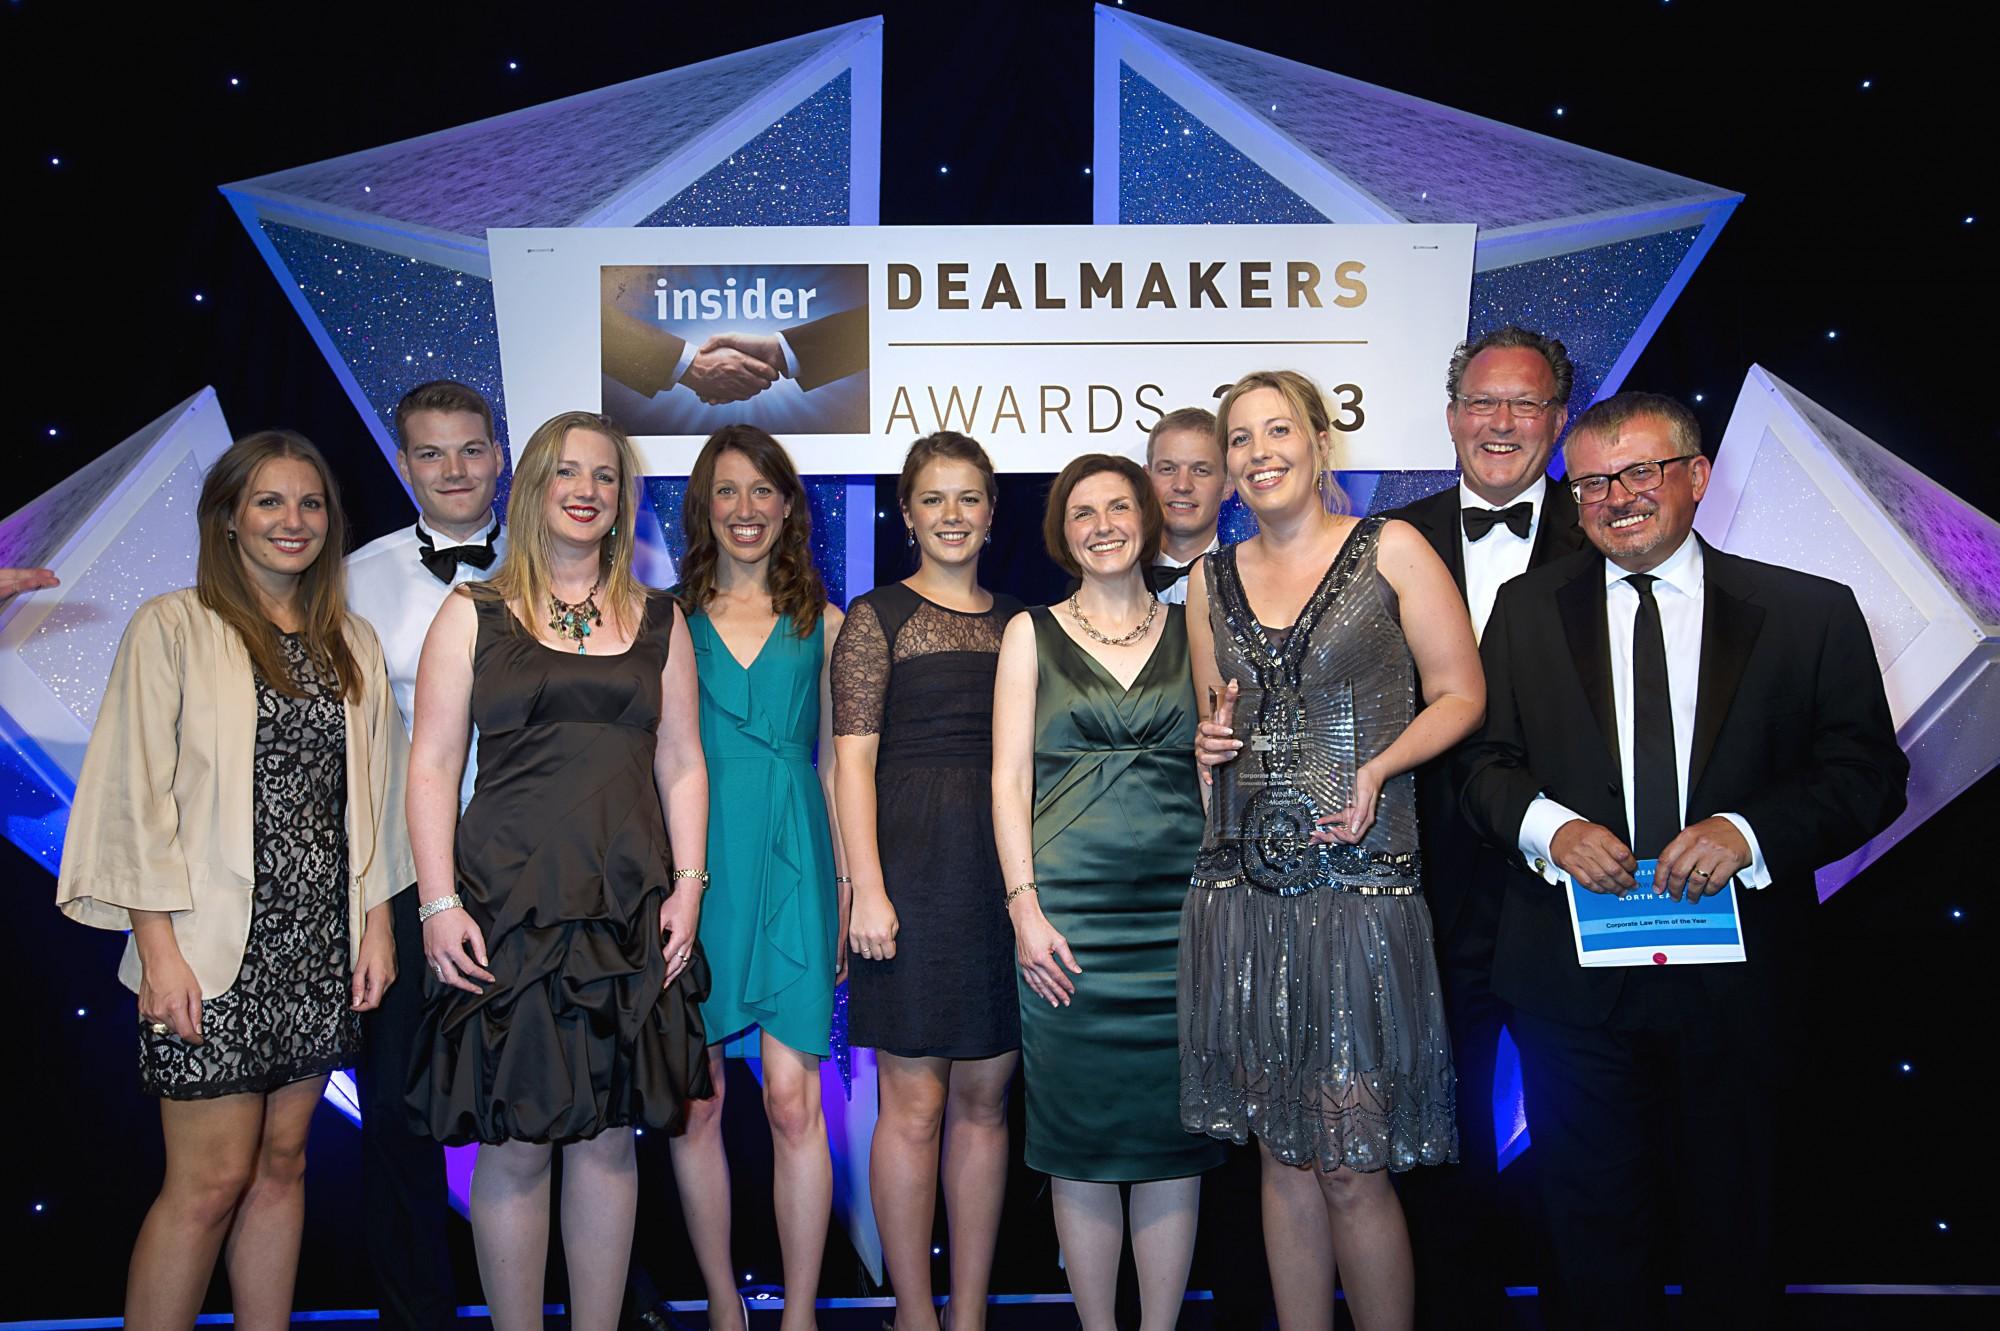 Insider Dealmakers win 2013